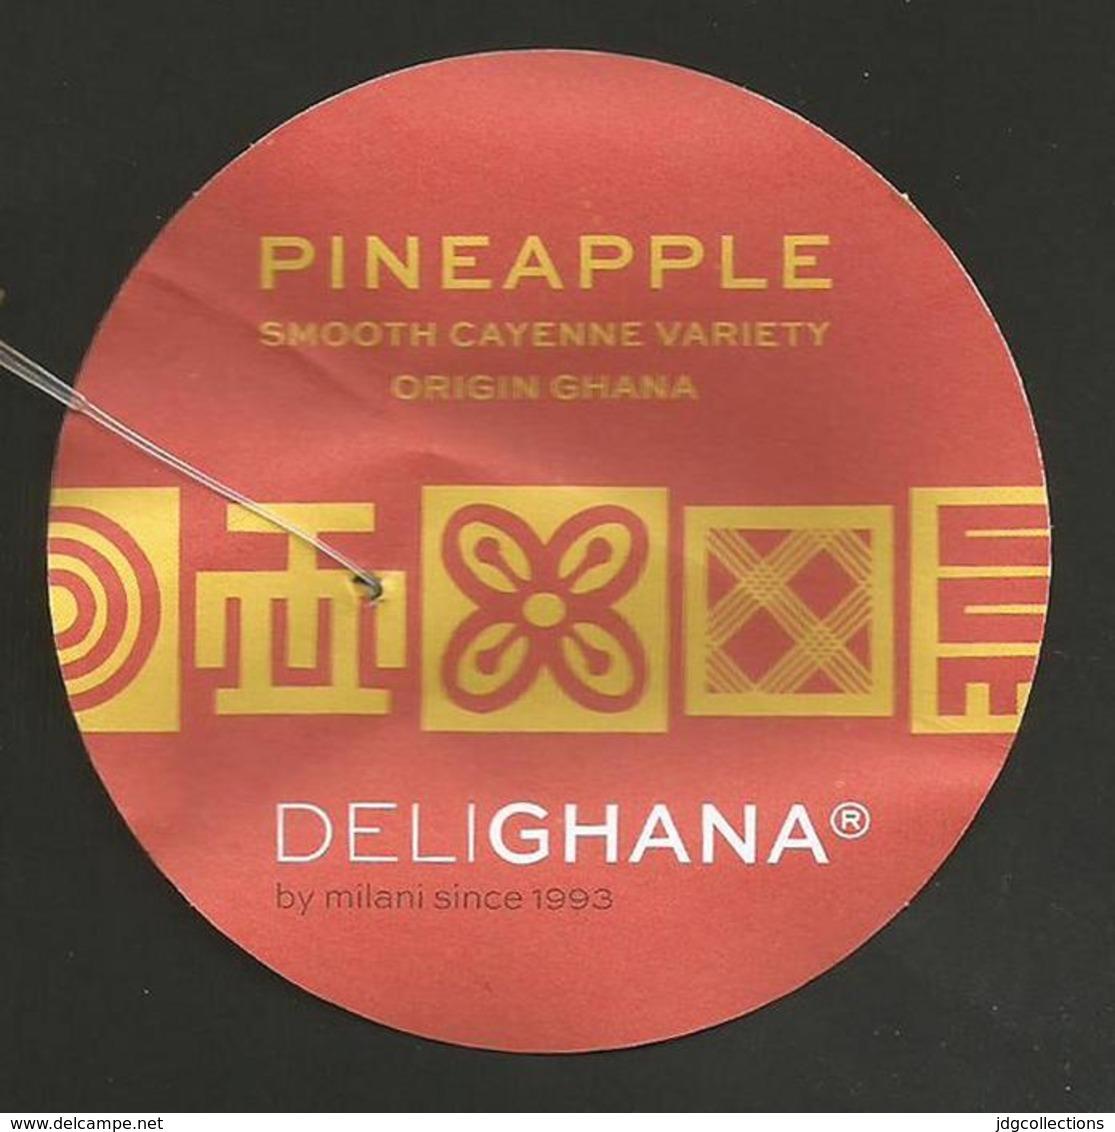 # PINEAPPLE DELIGHANA SMOOTH CAYENNE VARIETY Fruit Tag Balise Etiqueta Anhanger Ananas Pina Ghana Afrika - Fruits & Vegetables